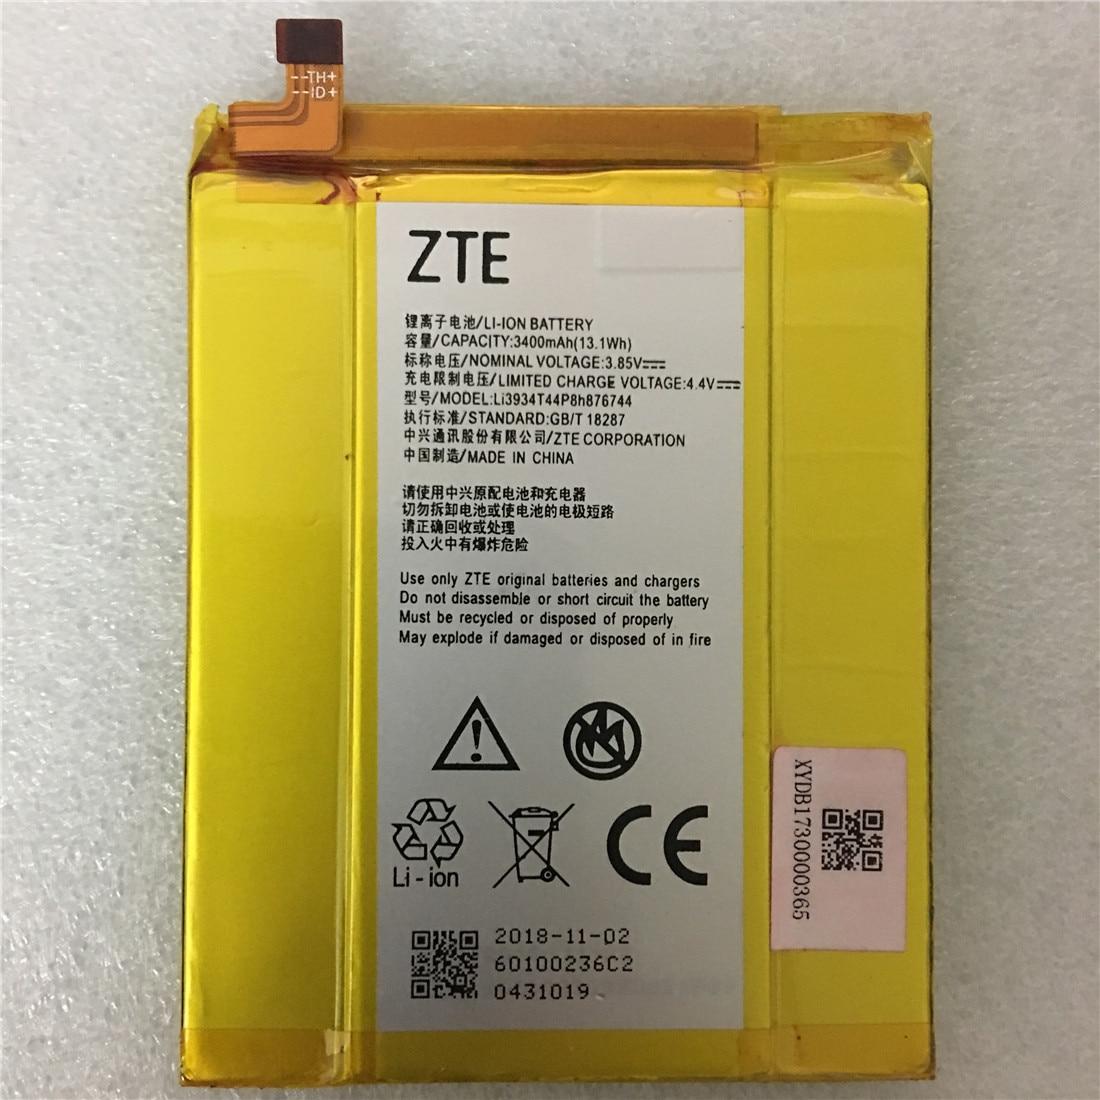 Original Grand Max 2 phone battery For ZTE Grand Max 2 Z988 Z981 Li3934T44p8h876744Original Grand Max 2 phone battery For ZTE Grand Max 2 Z988 Z981 Li3934T44p8h876744